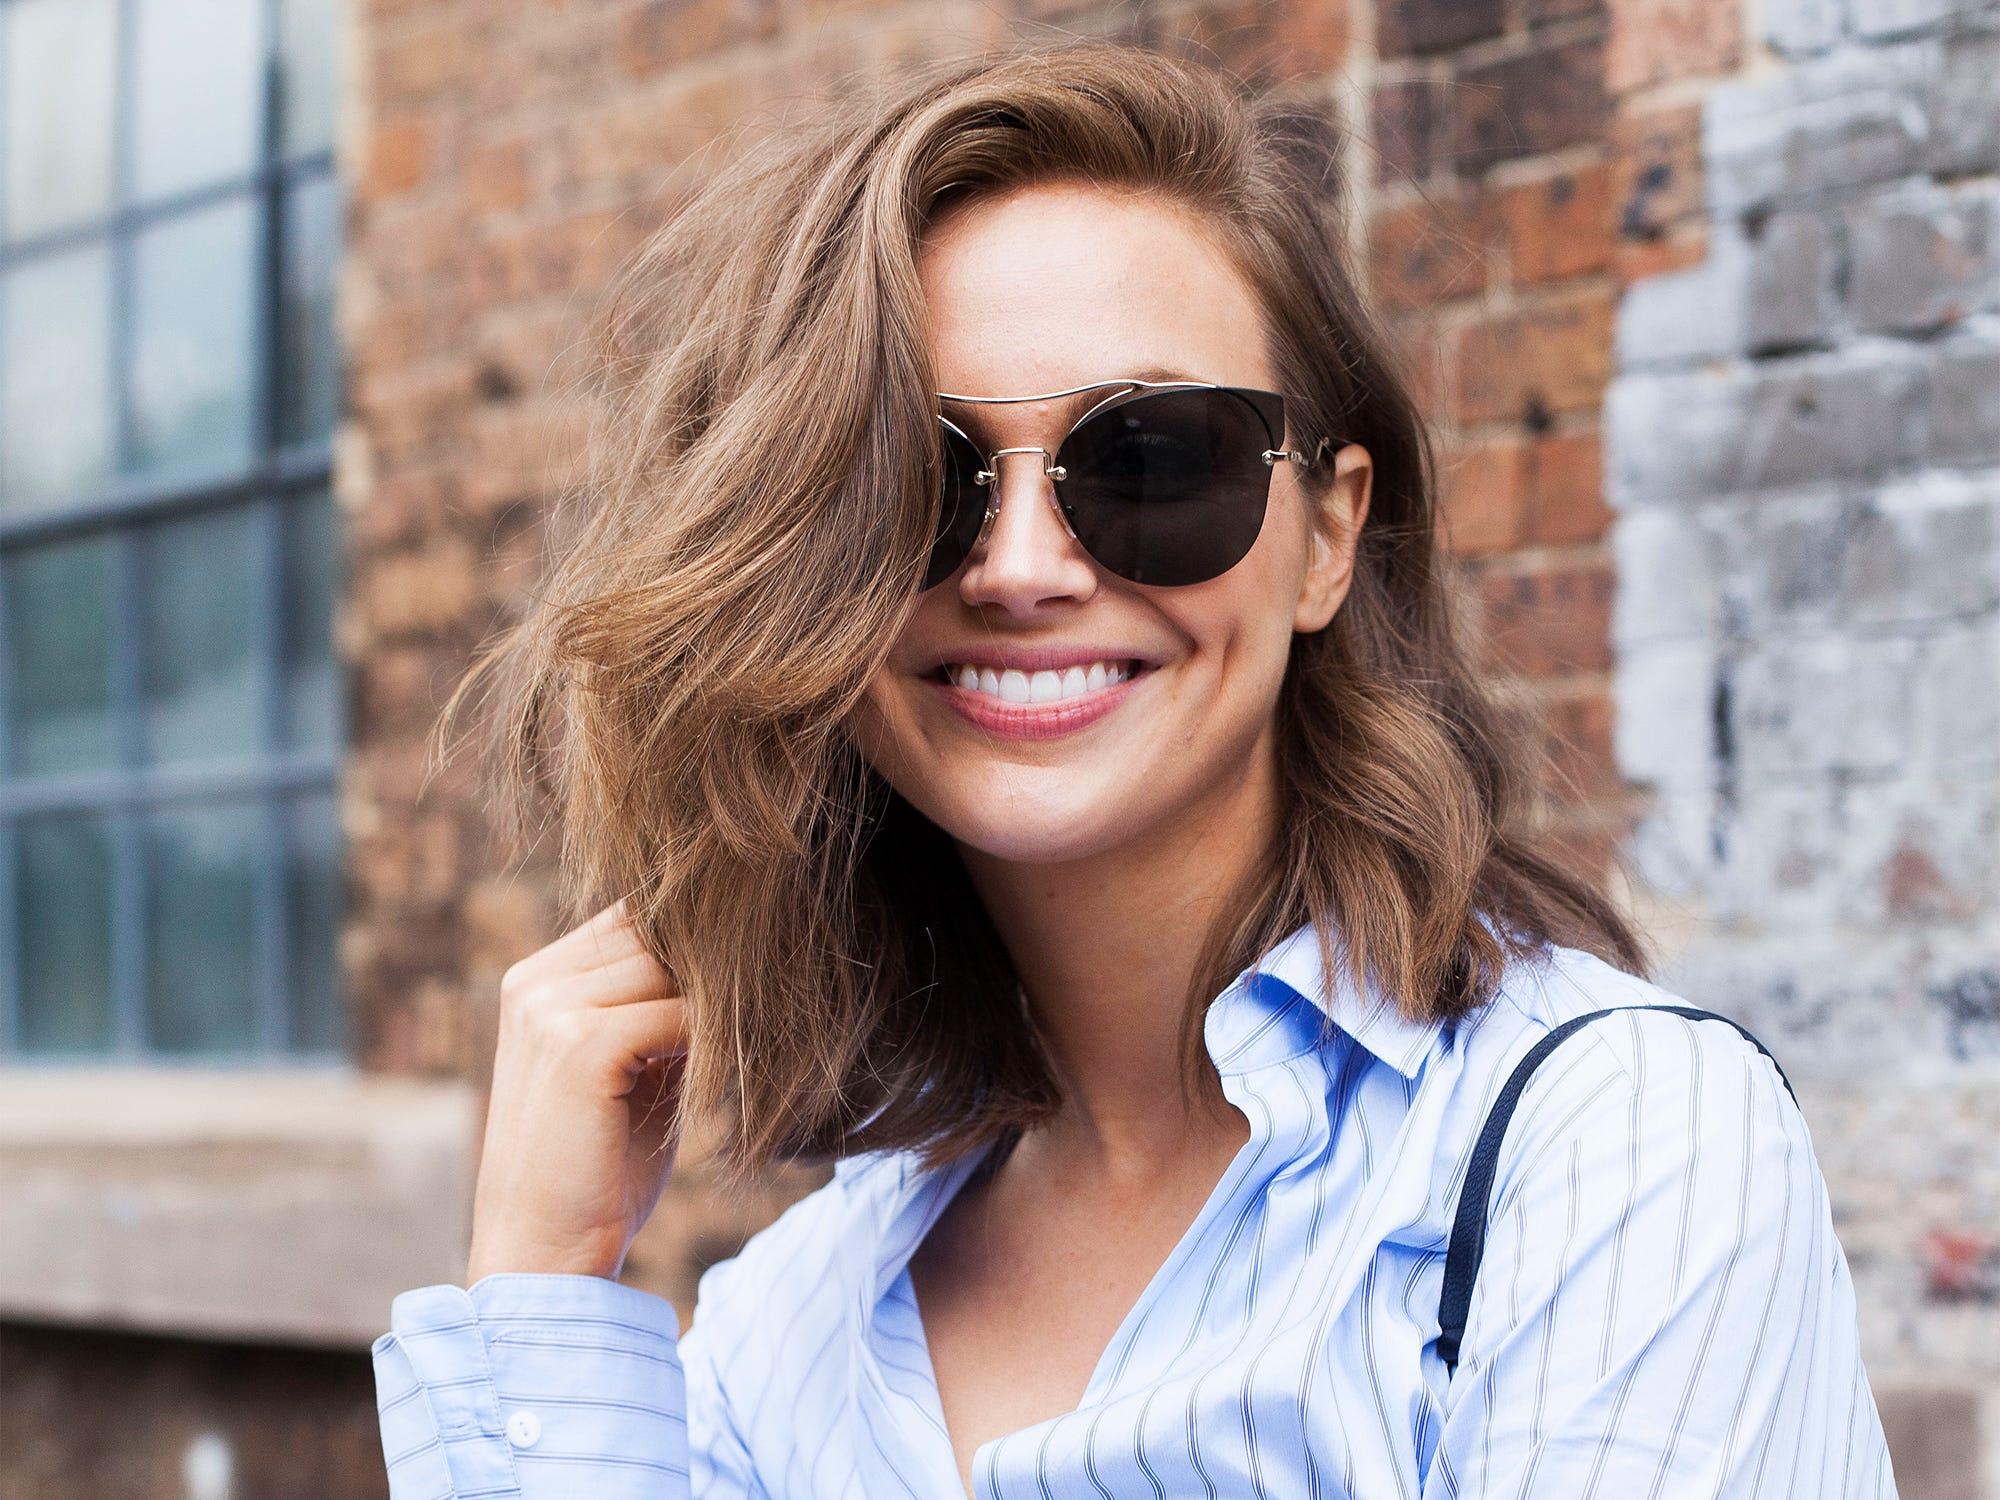 e6dfac96804 Popular International Hair Trends And Haircuts 2019